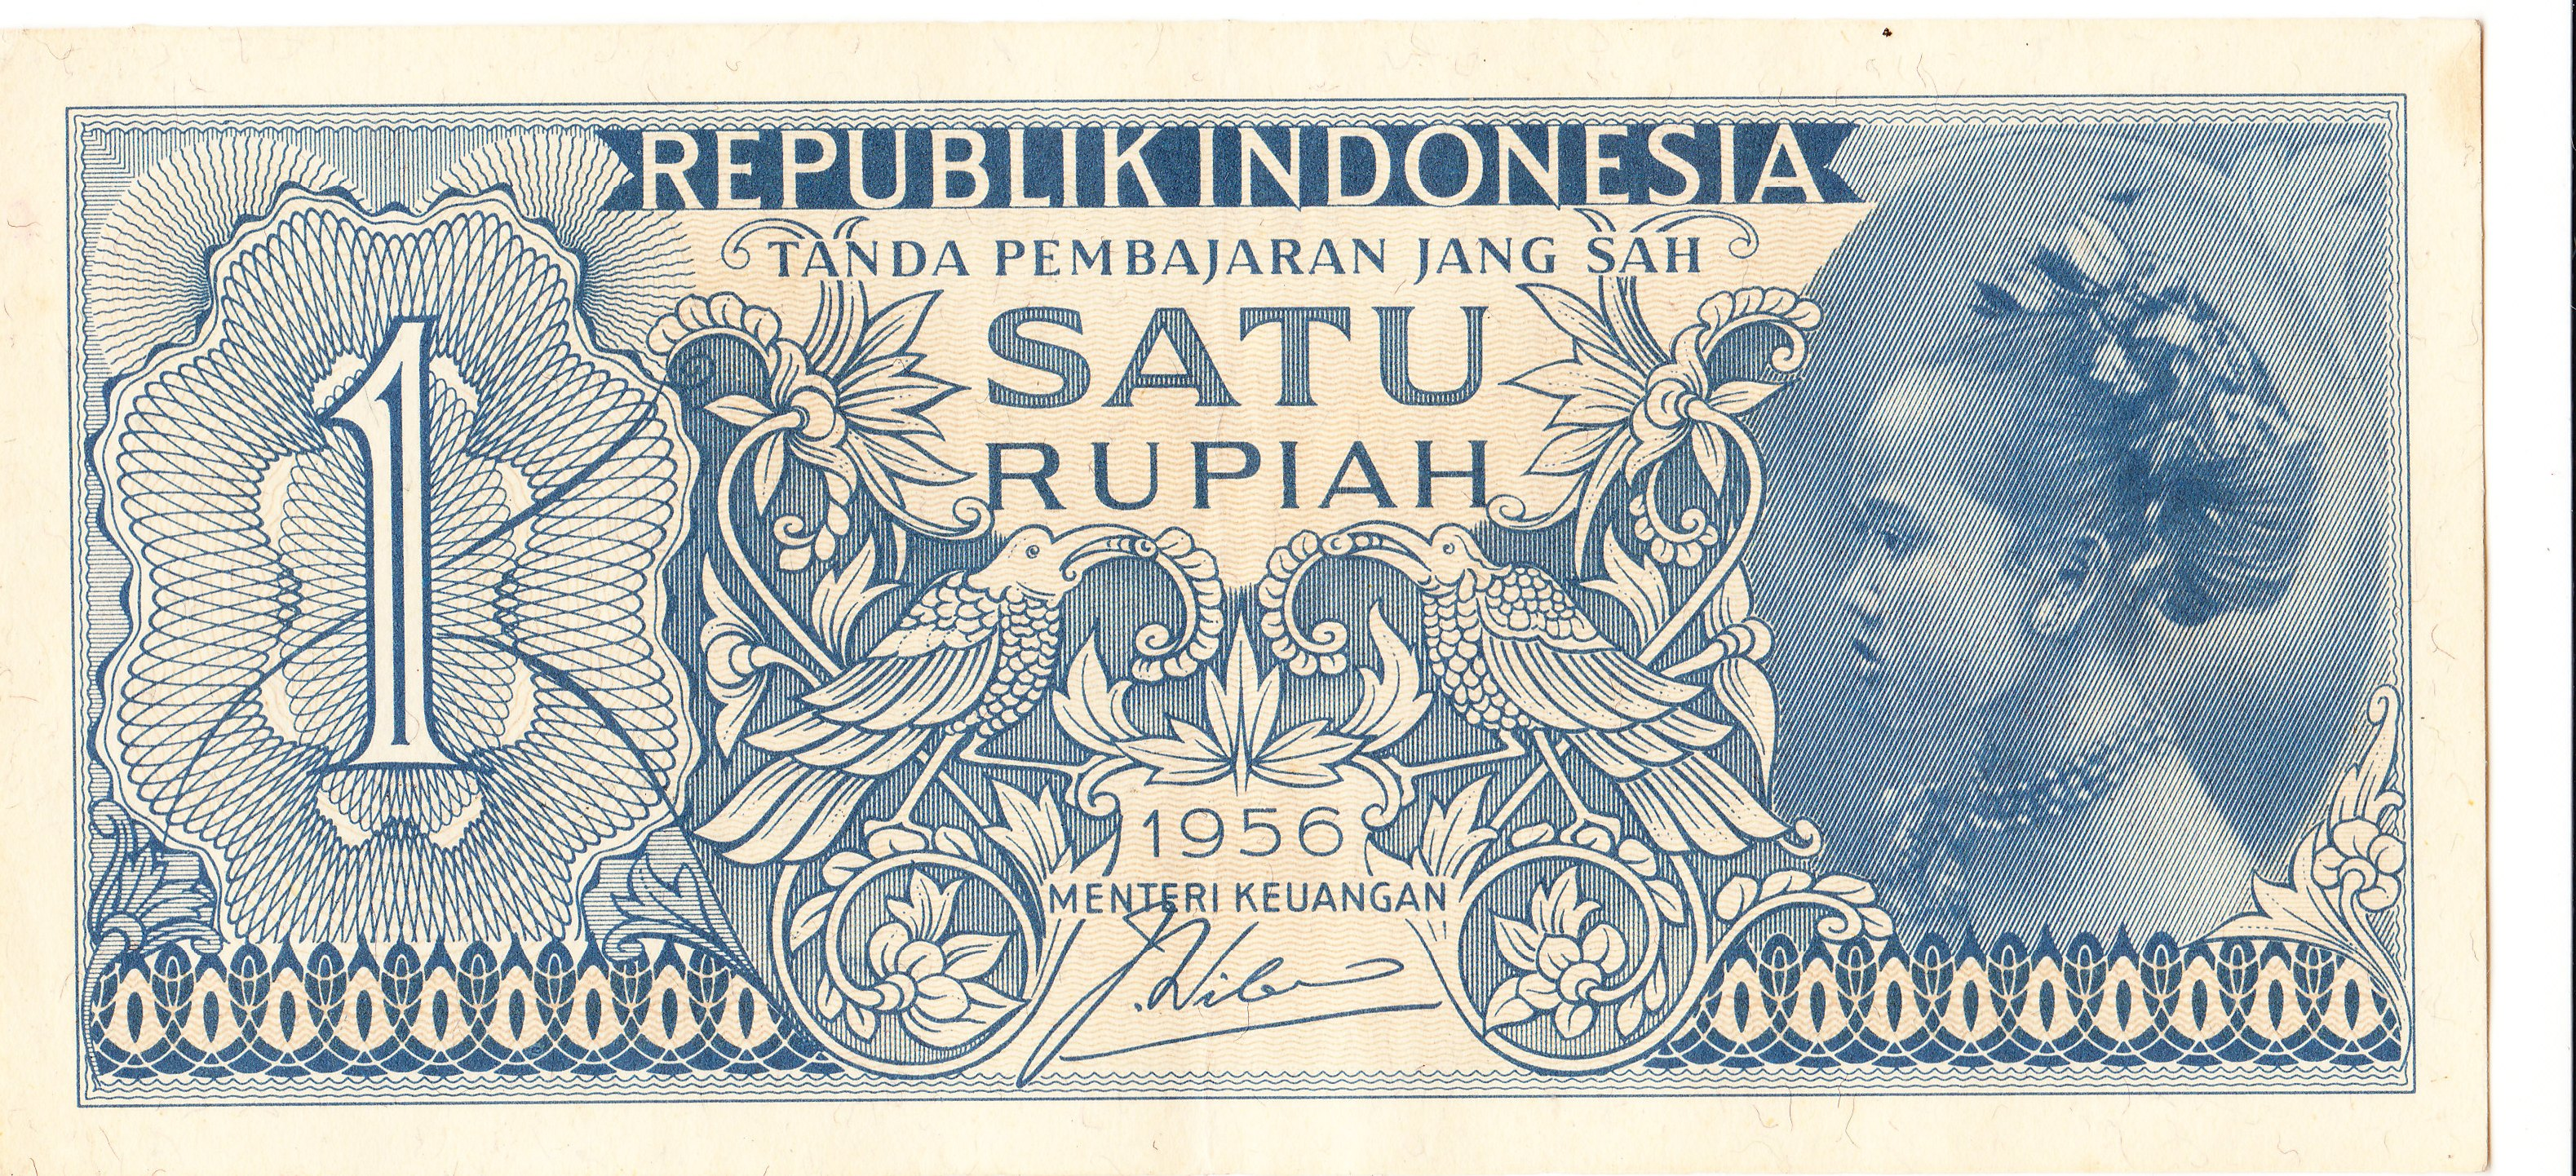 Kemanakah Uang satu rupiah jaman dulu ?